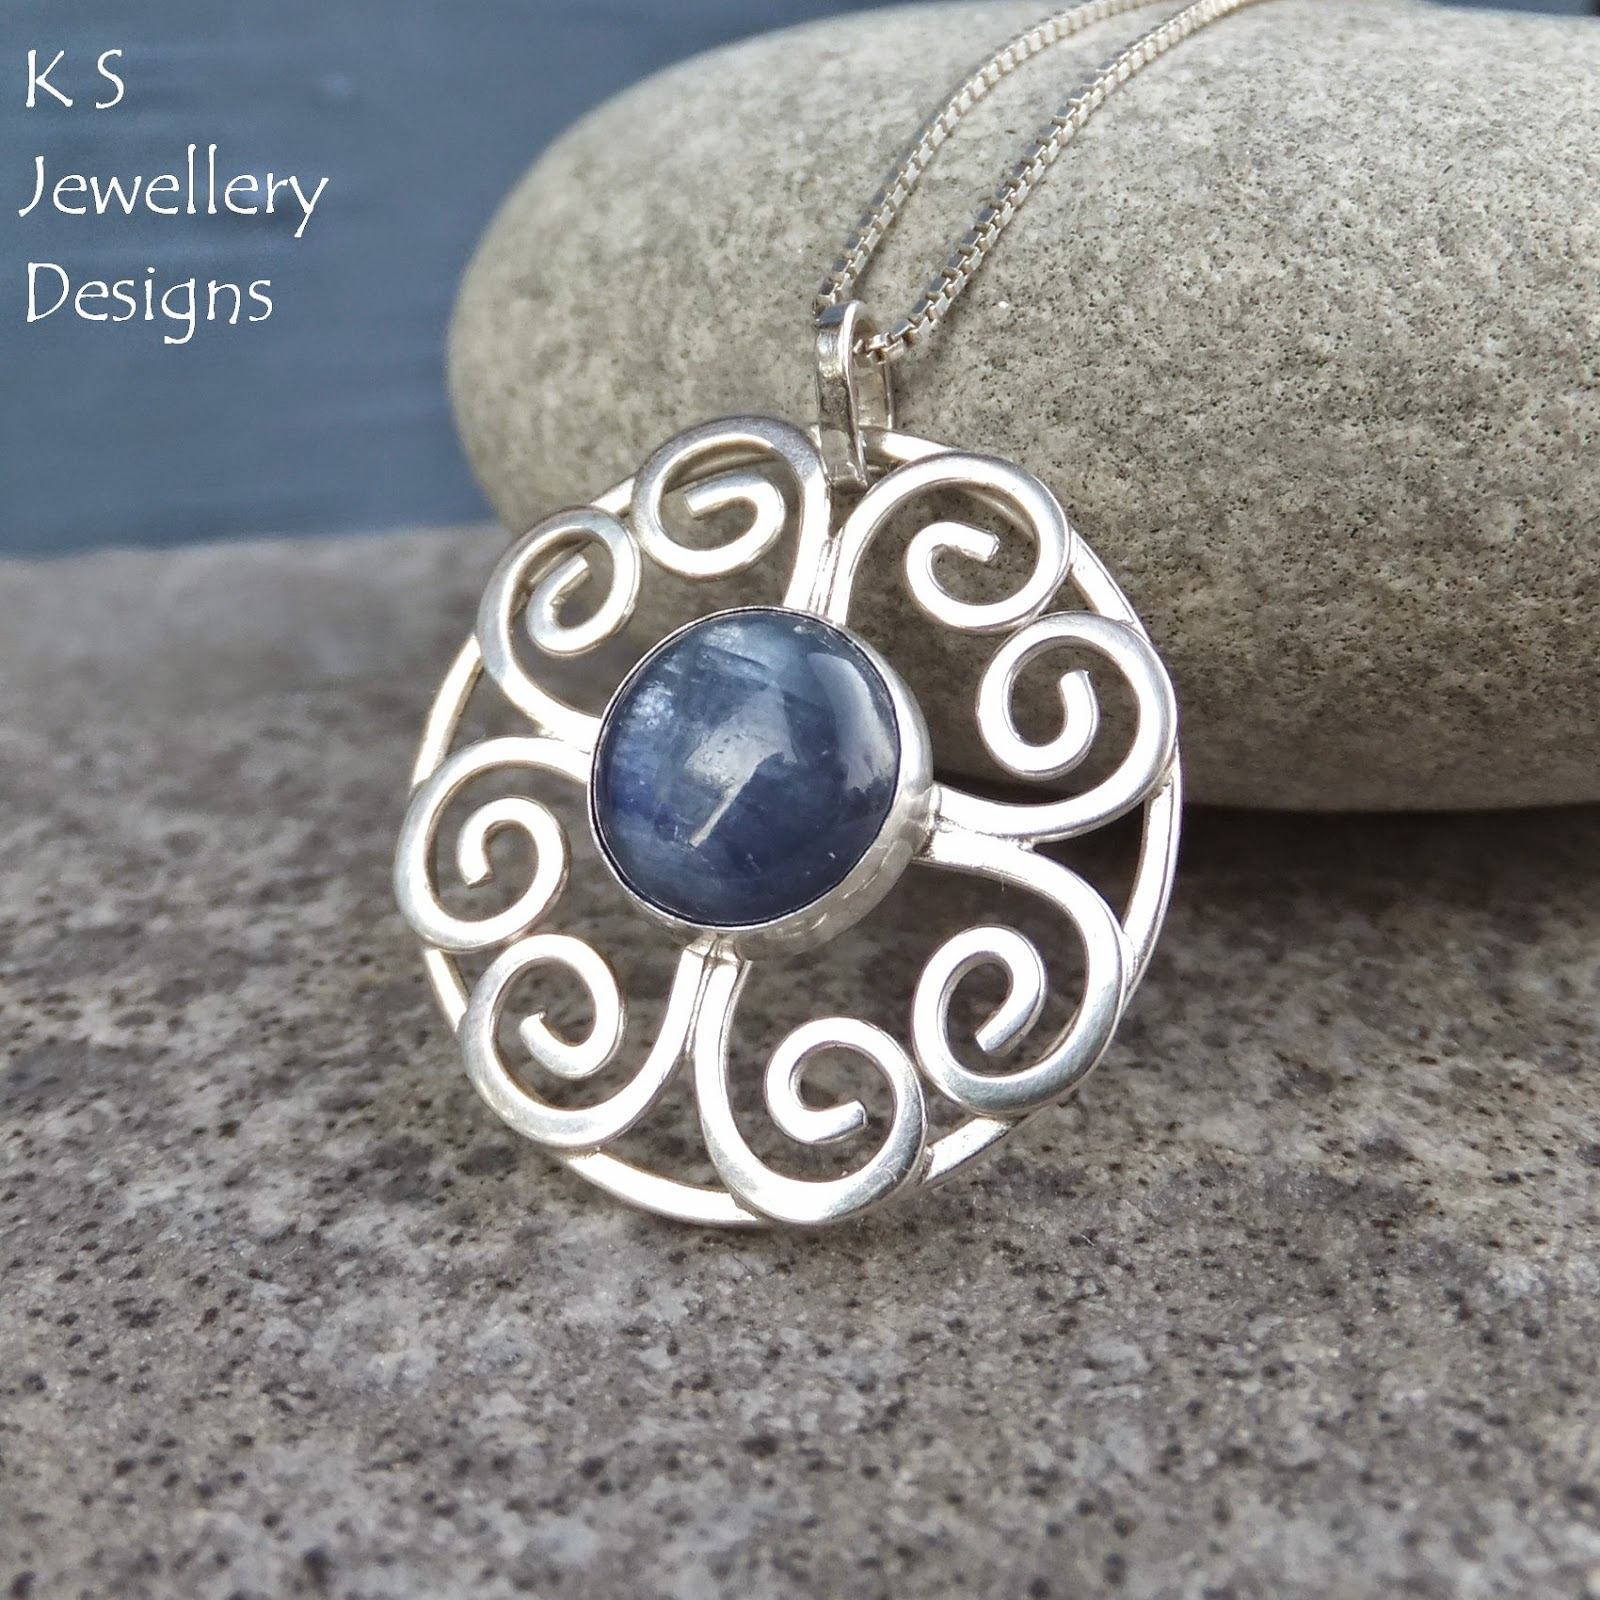 http://ksjewellerydesigns.co.uk/ourshop/prod_3584224-Kyanite-Heart-Circle-Sterling-Silver-Pendant.html